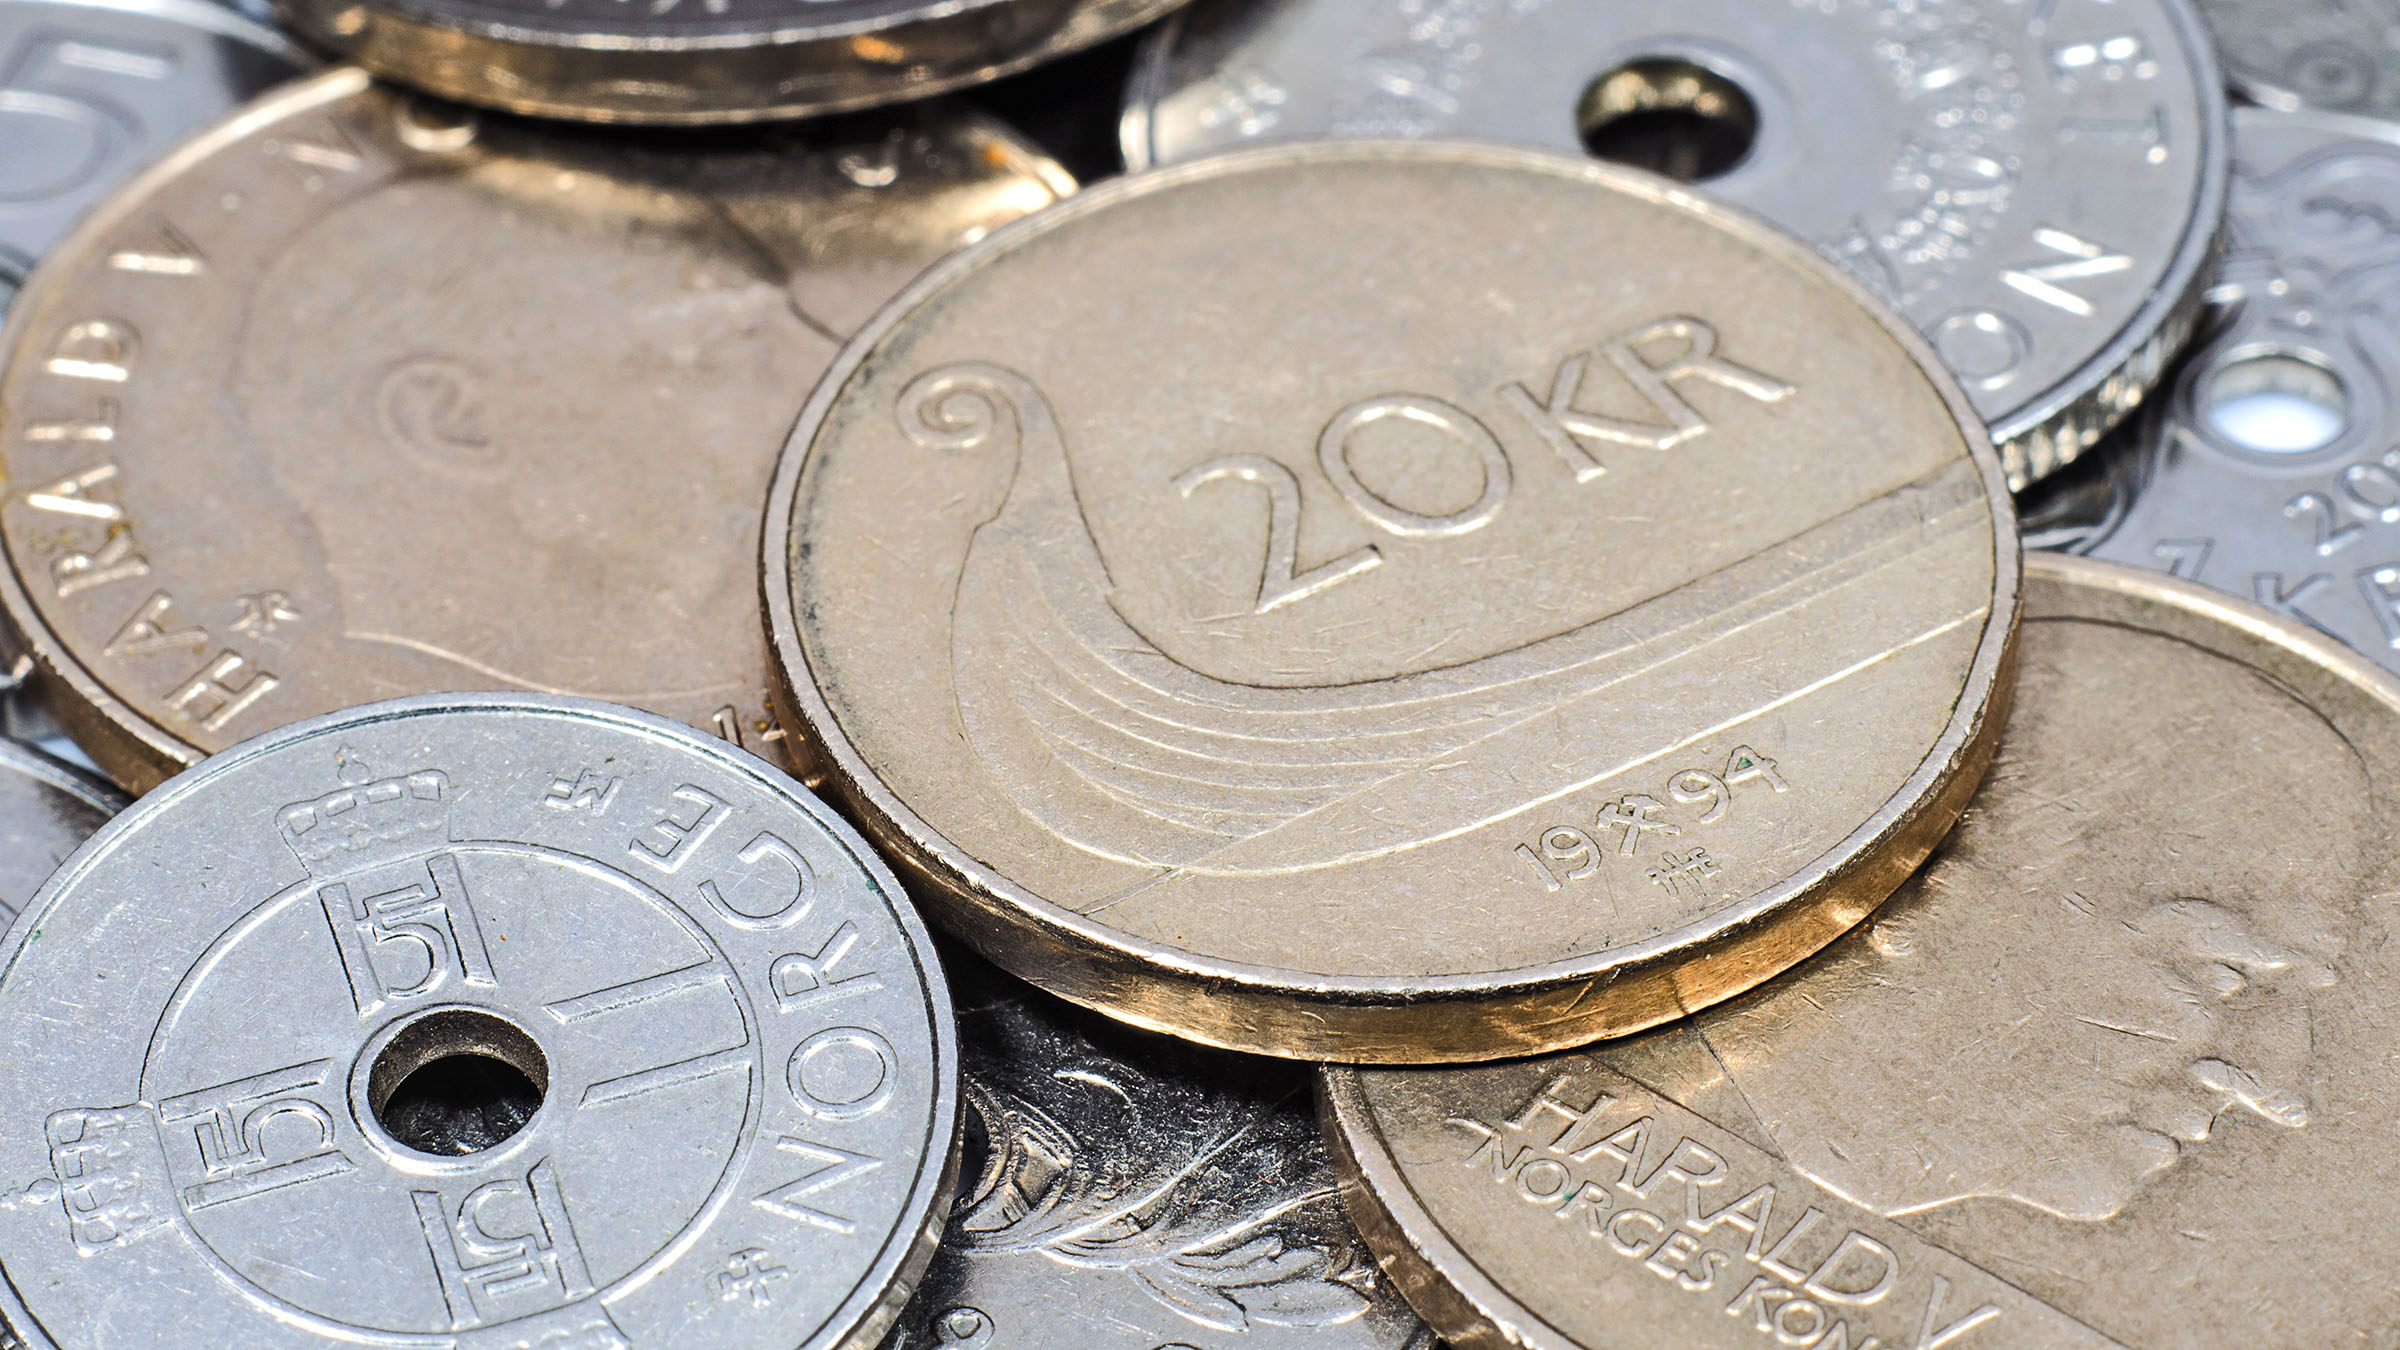 La moneda de Noruega